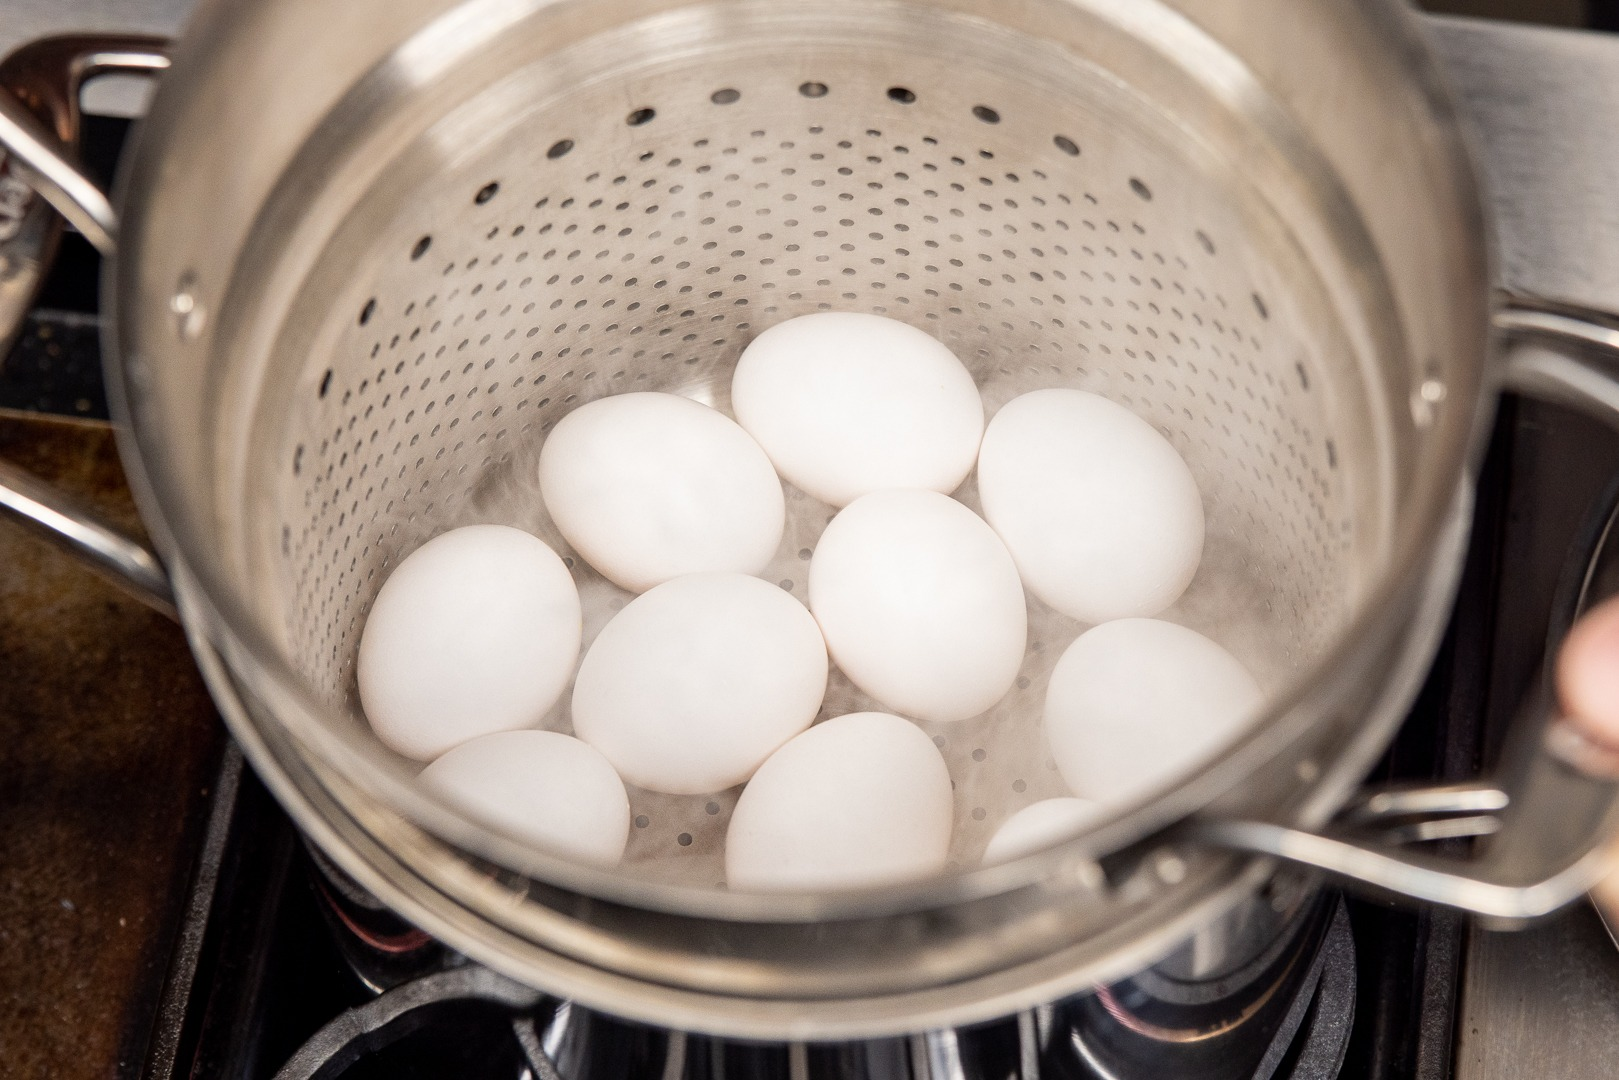 Eggs in the steamer basket